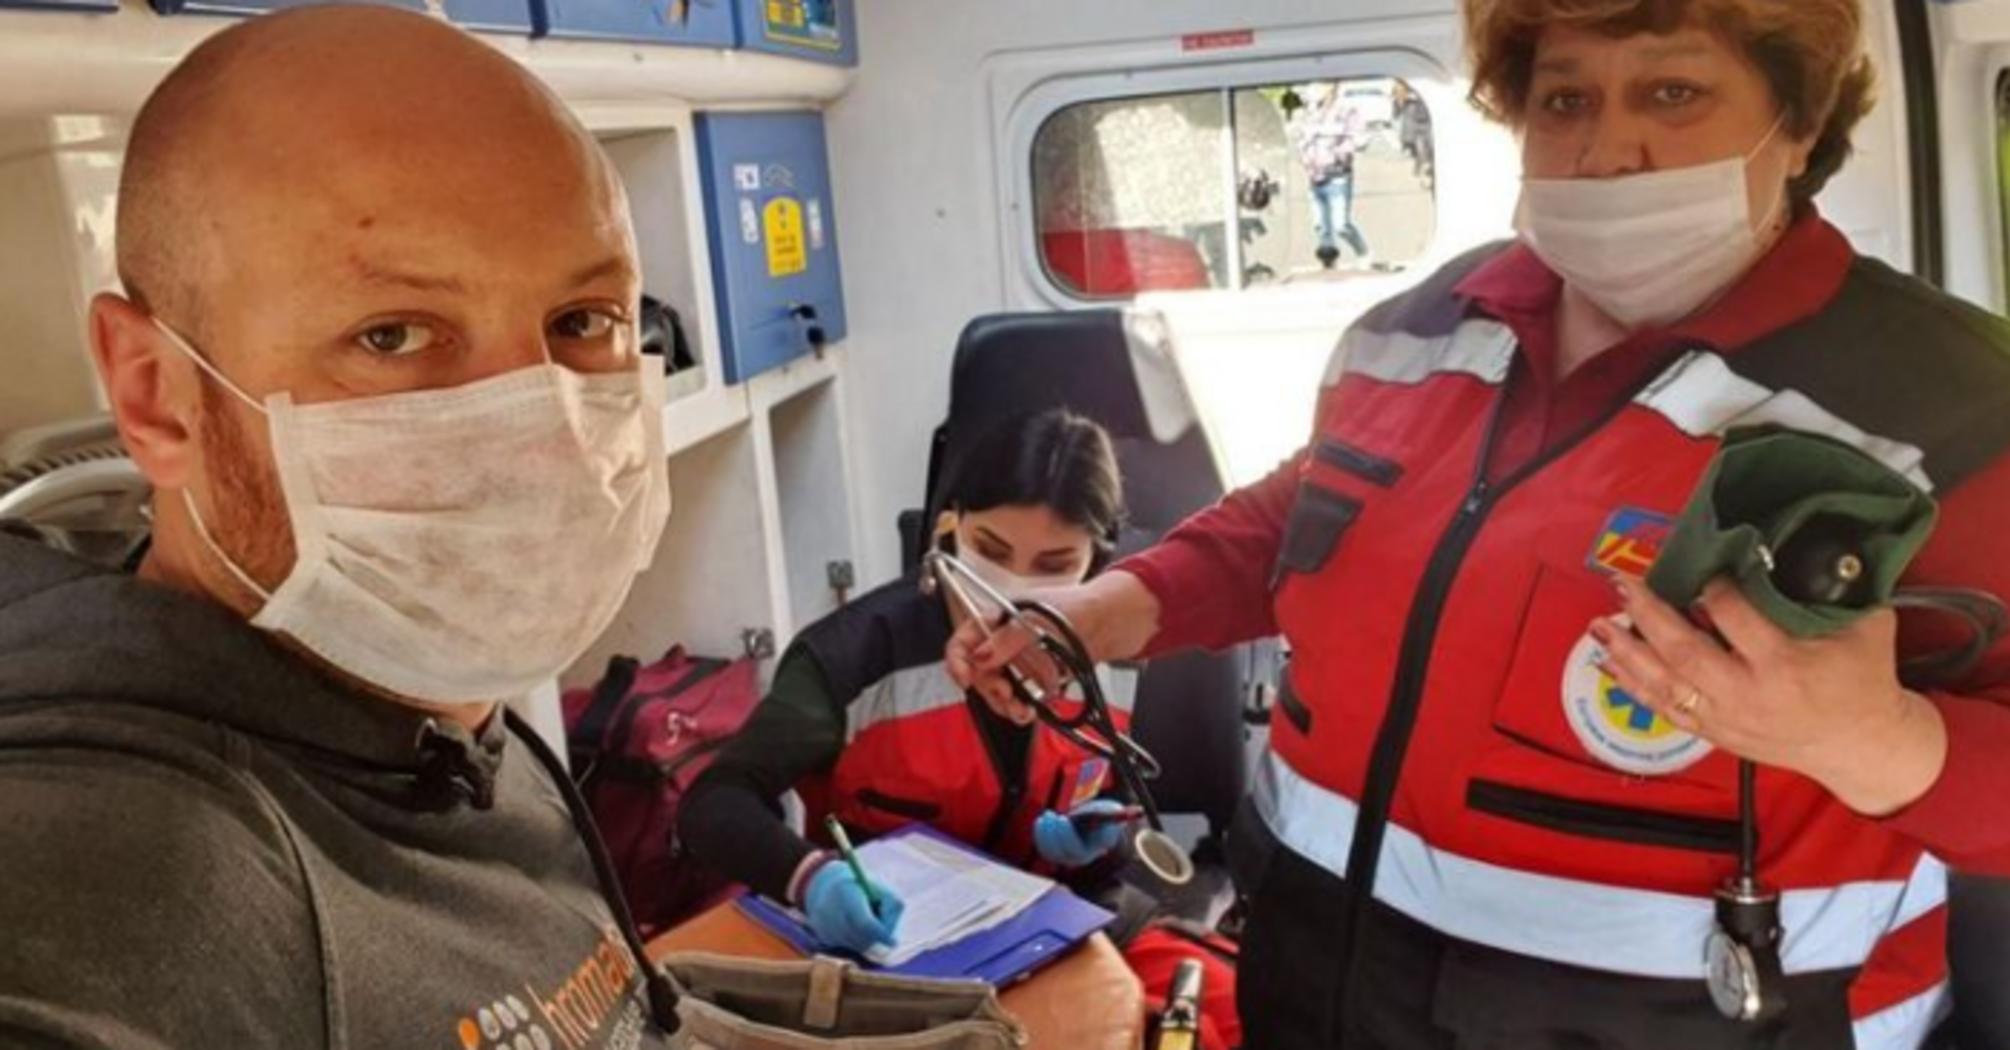 В Киеве полиция напала на журналиста Hromadske под зданием Кабмина и сломала его технику